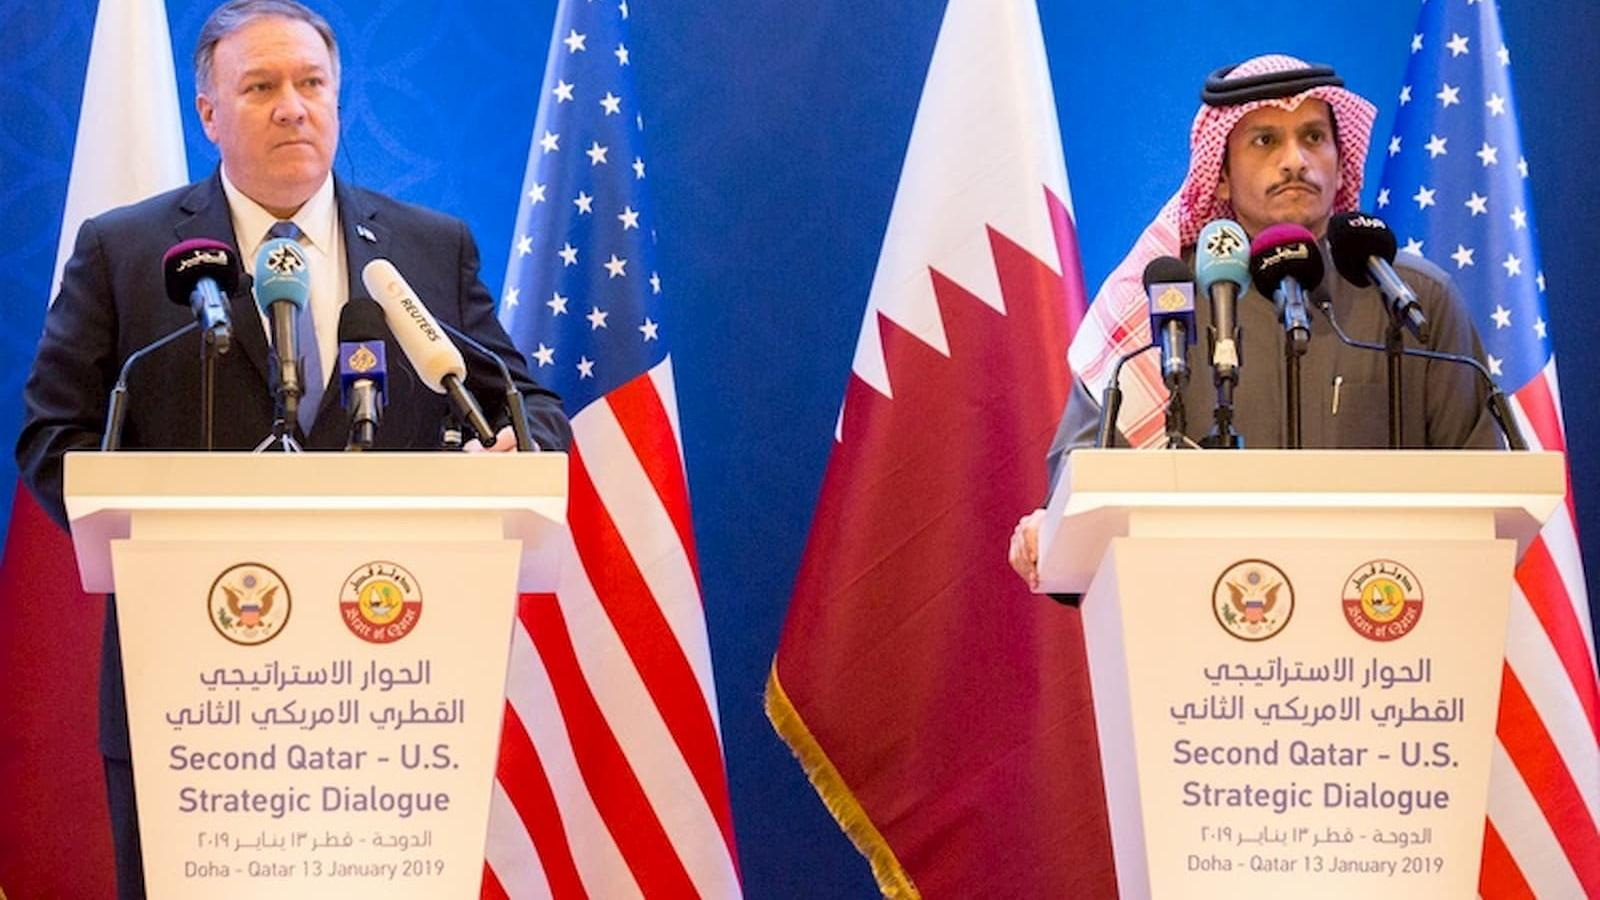 Third Qatar-US Strategic Dialogue to begin in Washington today